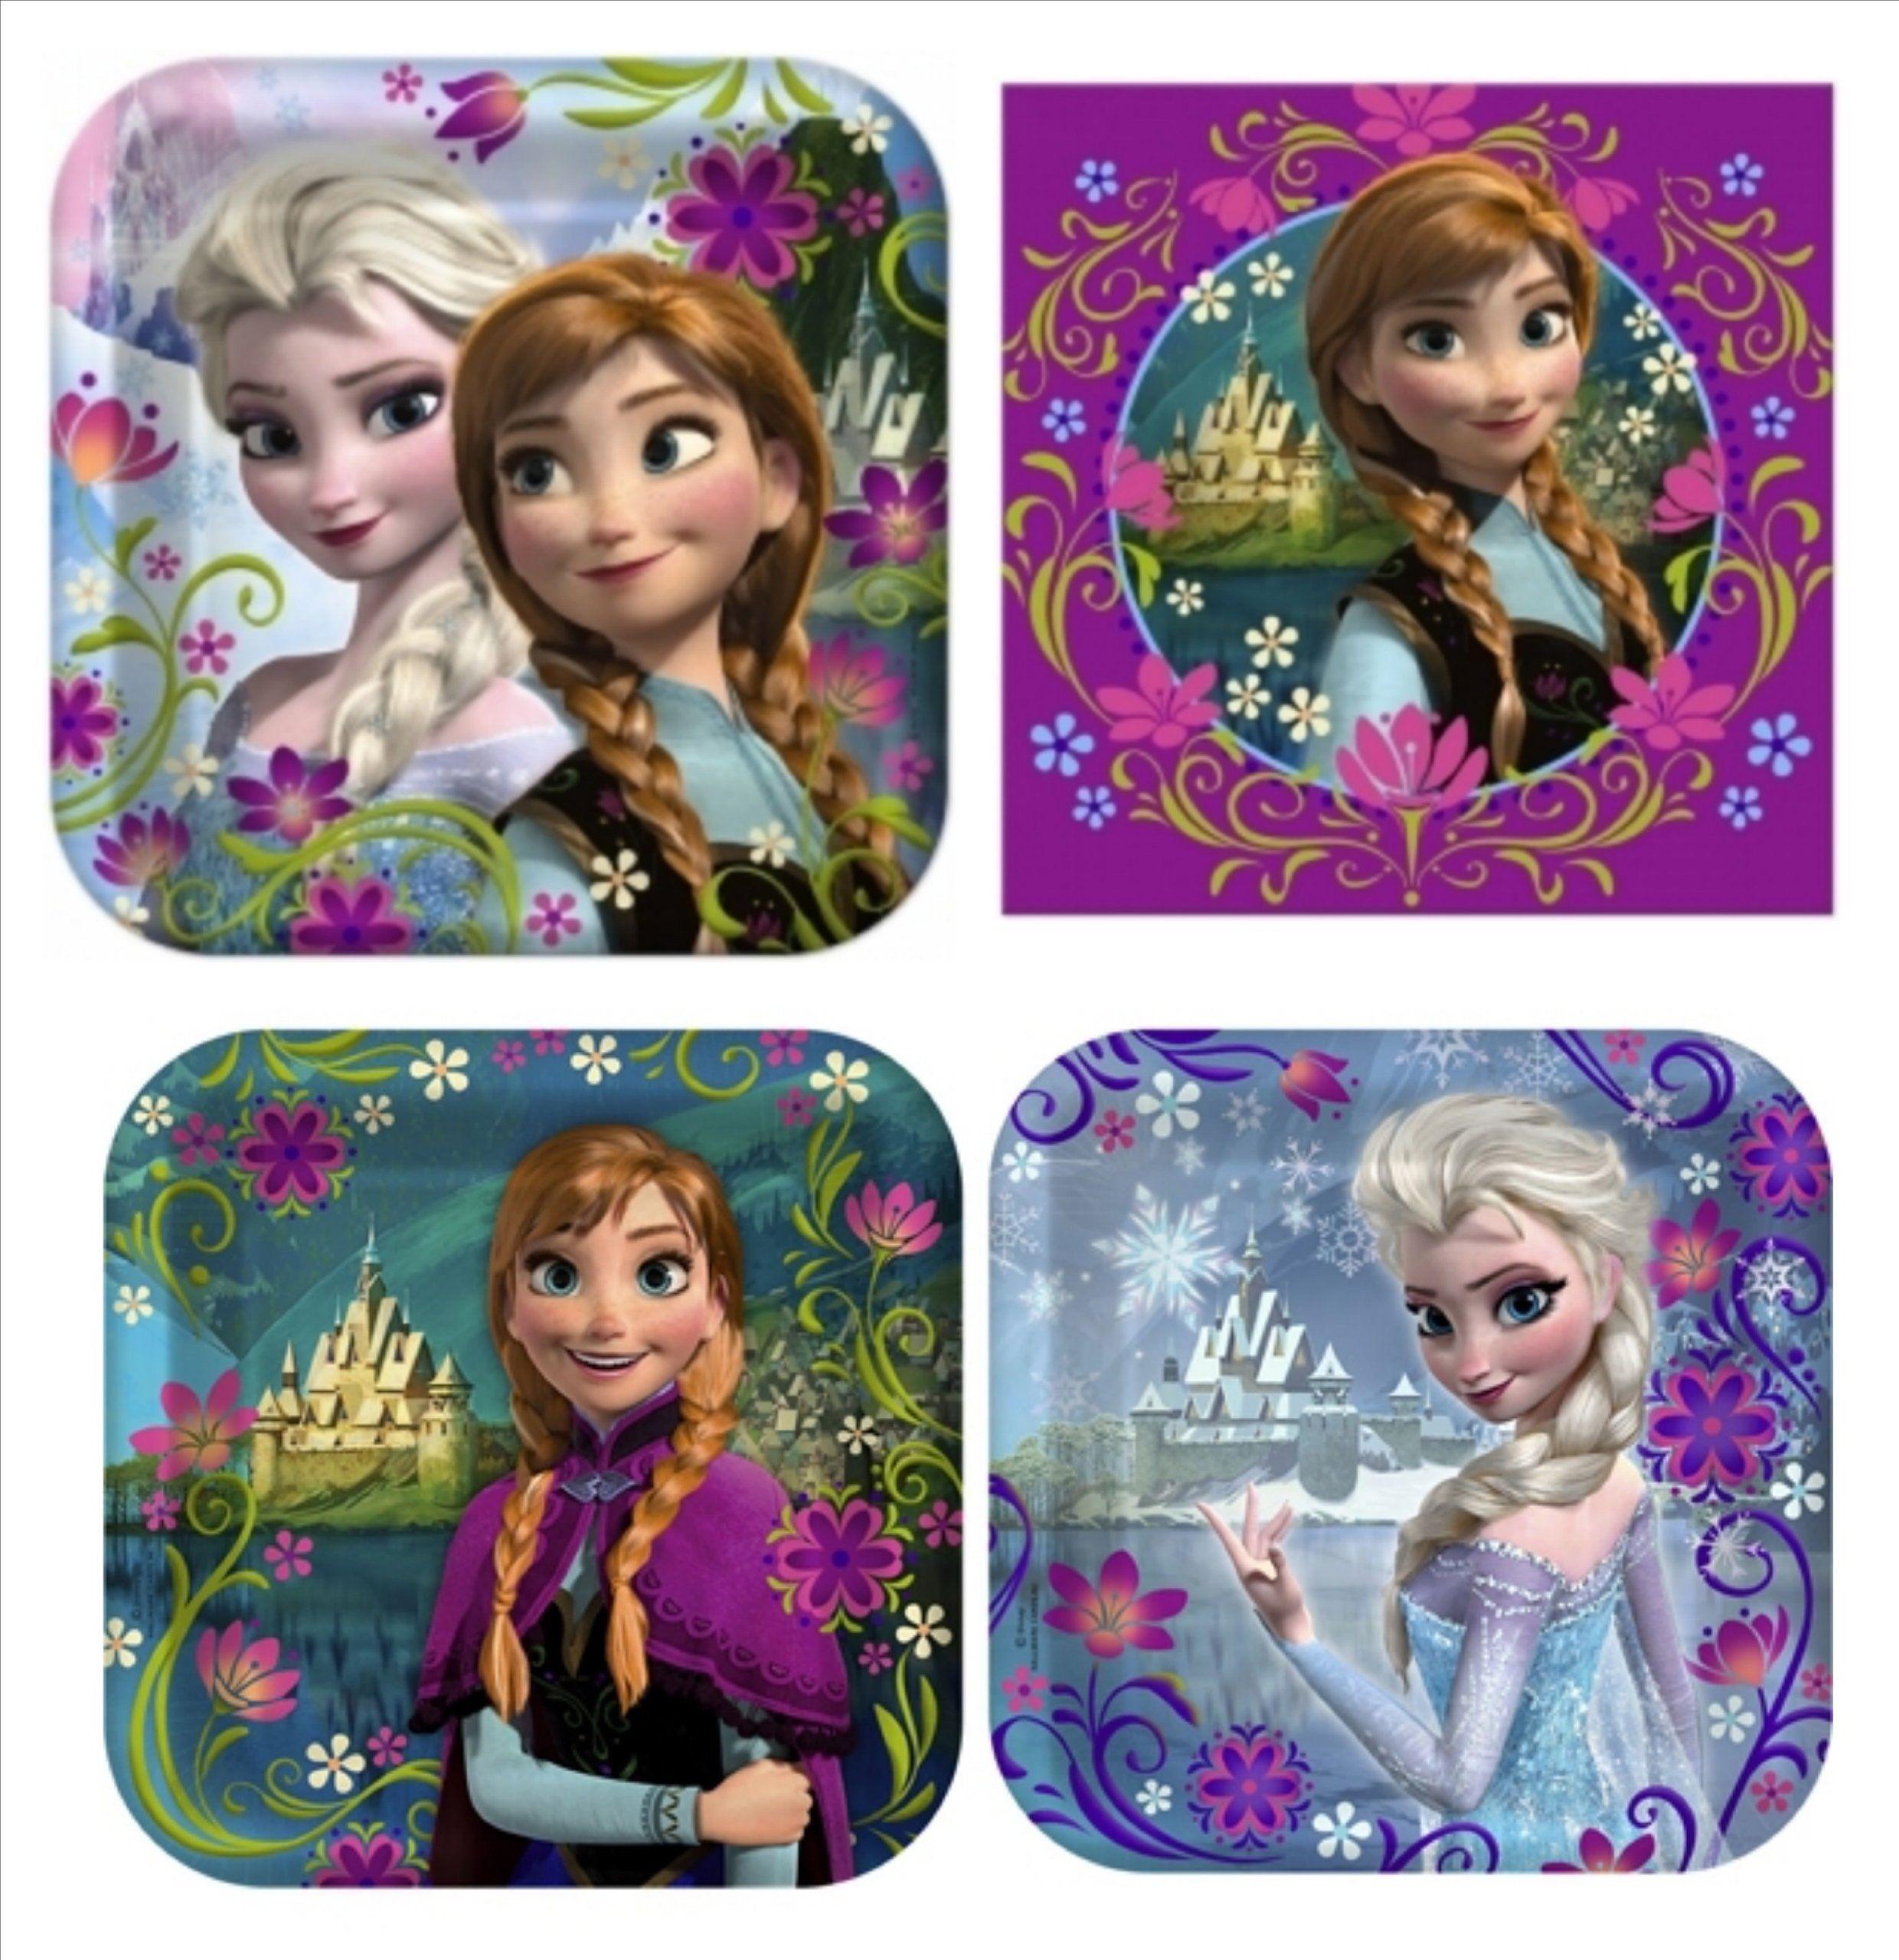 Disney Frozen Birthday Party Supplies WebNuggetzcom Disney